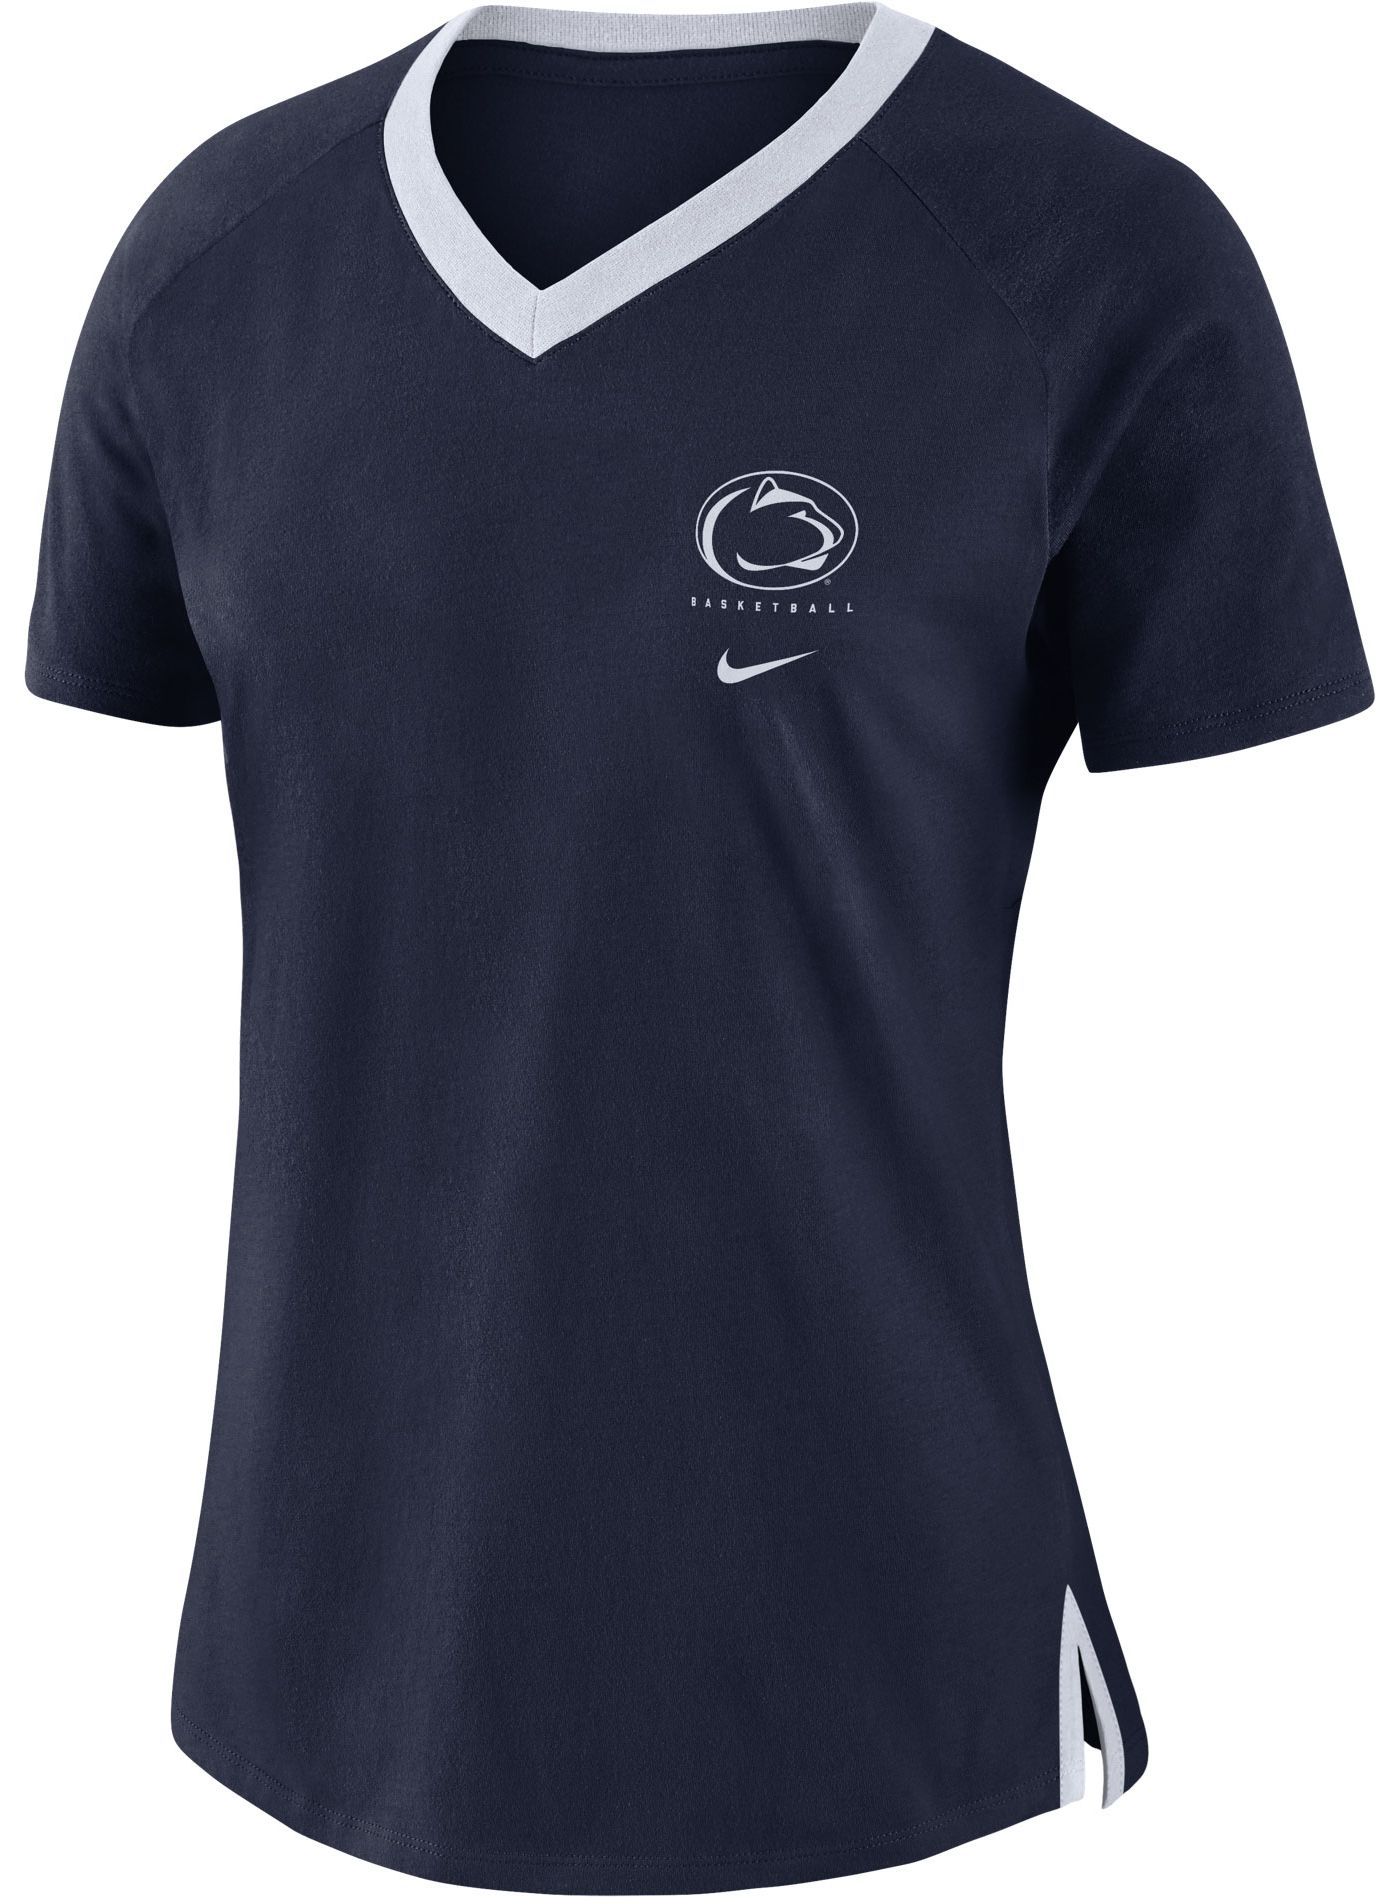 Nike Women's Penn State Nittany Lions Blue Tri-Blend Basketball Fan T-Shirt